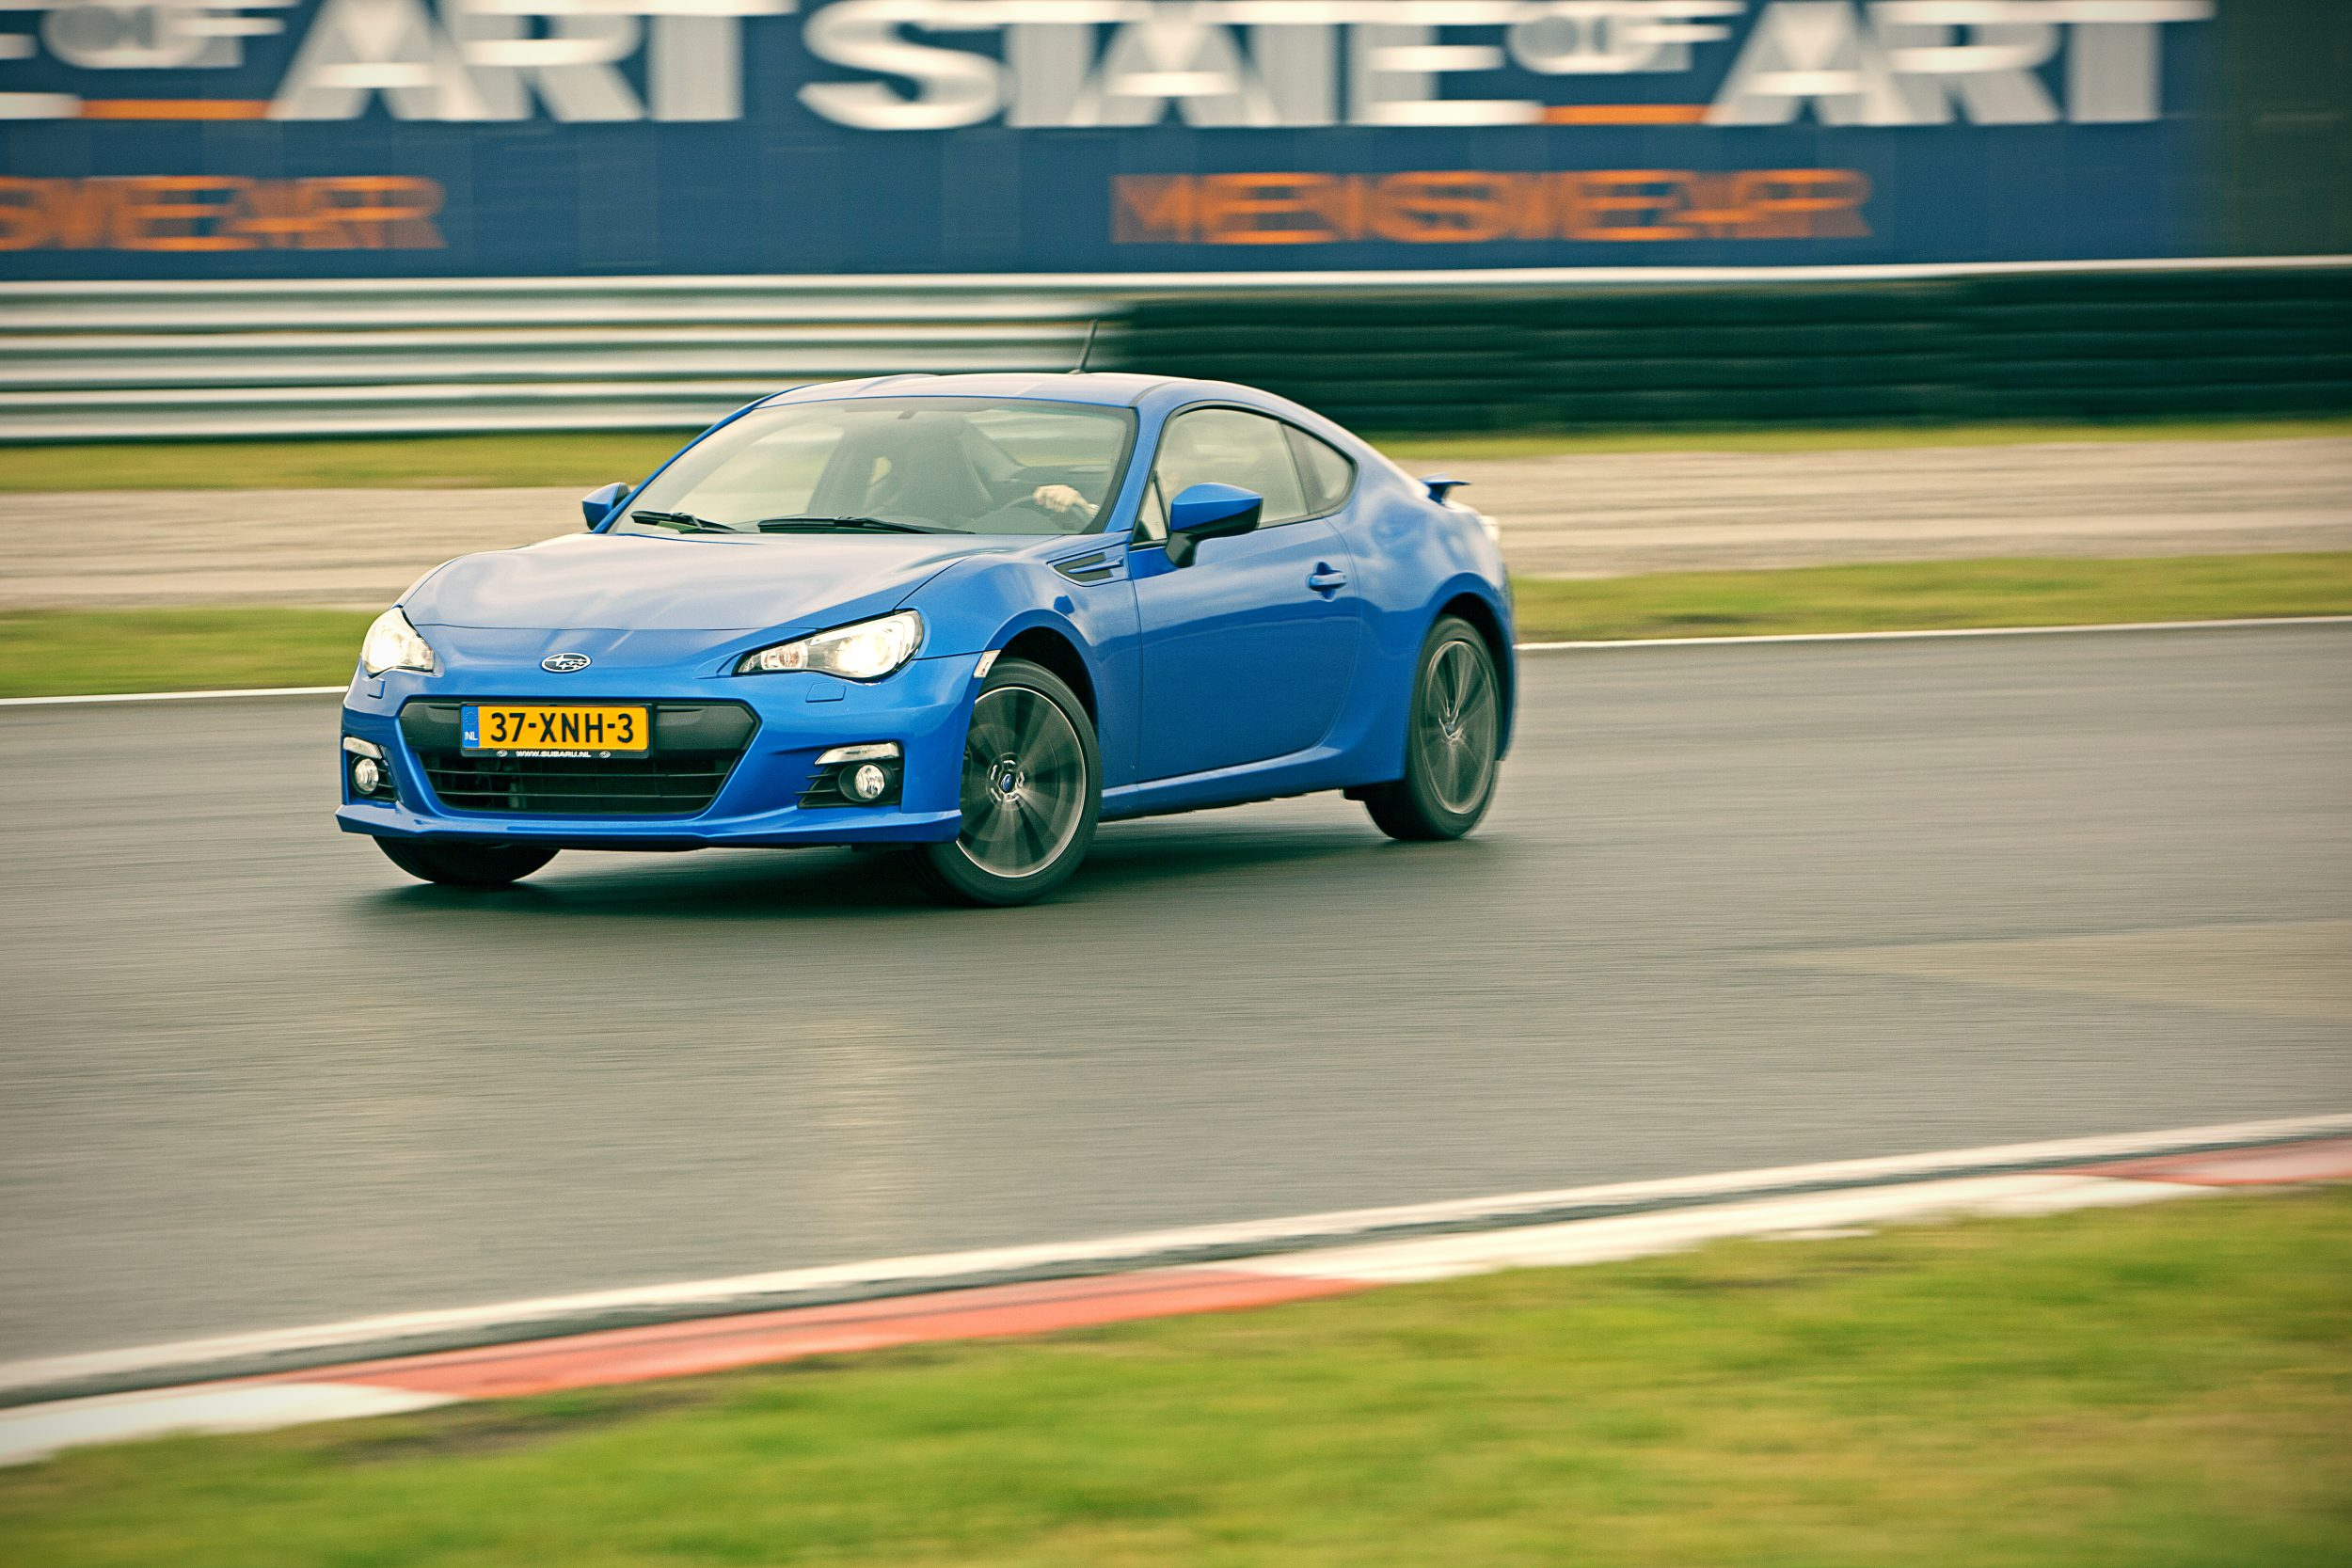 Throwback Thursday - Peter Hilhorst - Subaru BRZ - Autovisie.nl